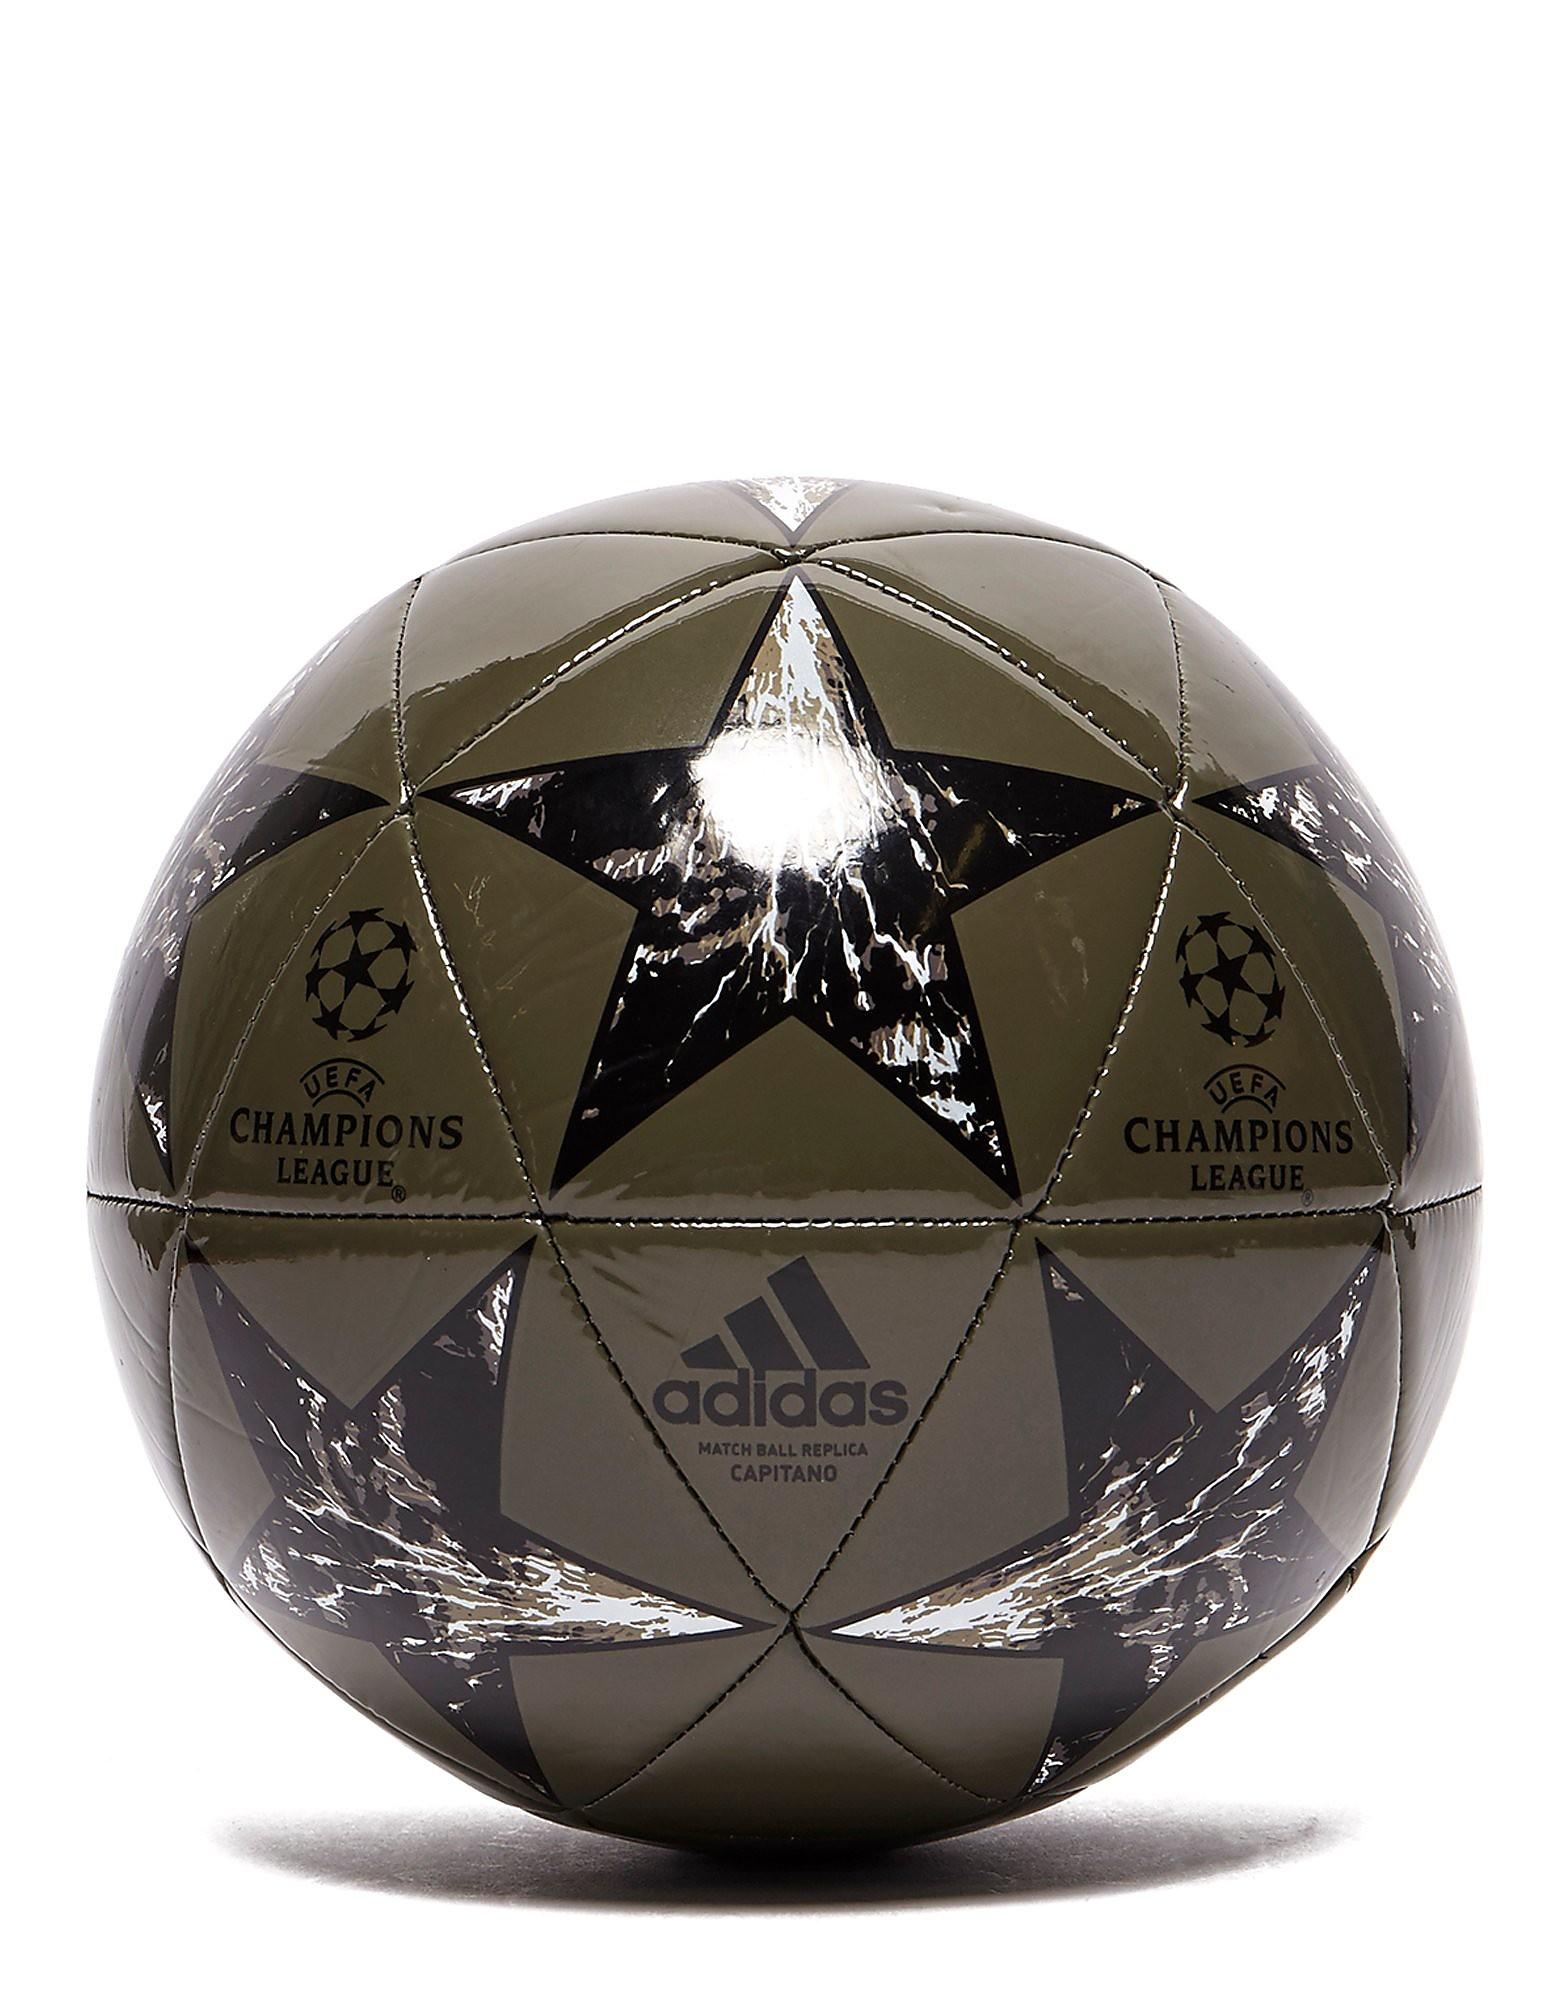 adidas Capitano Champions League Football